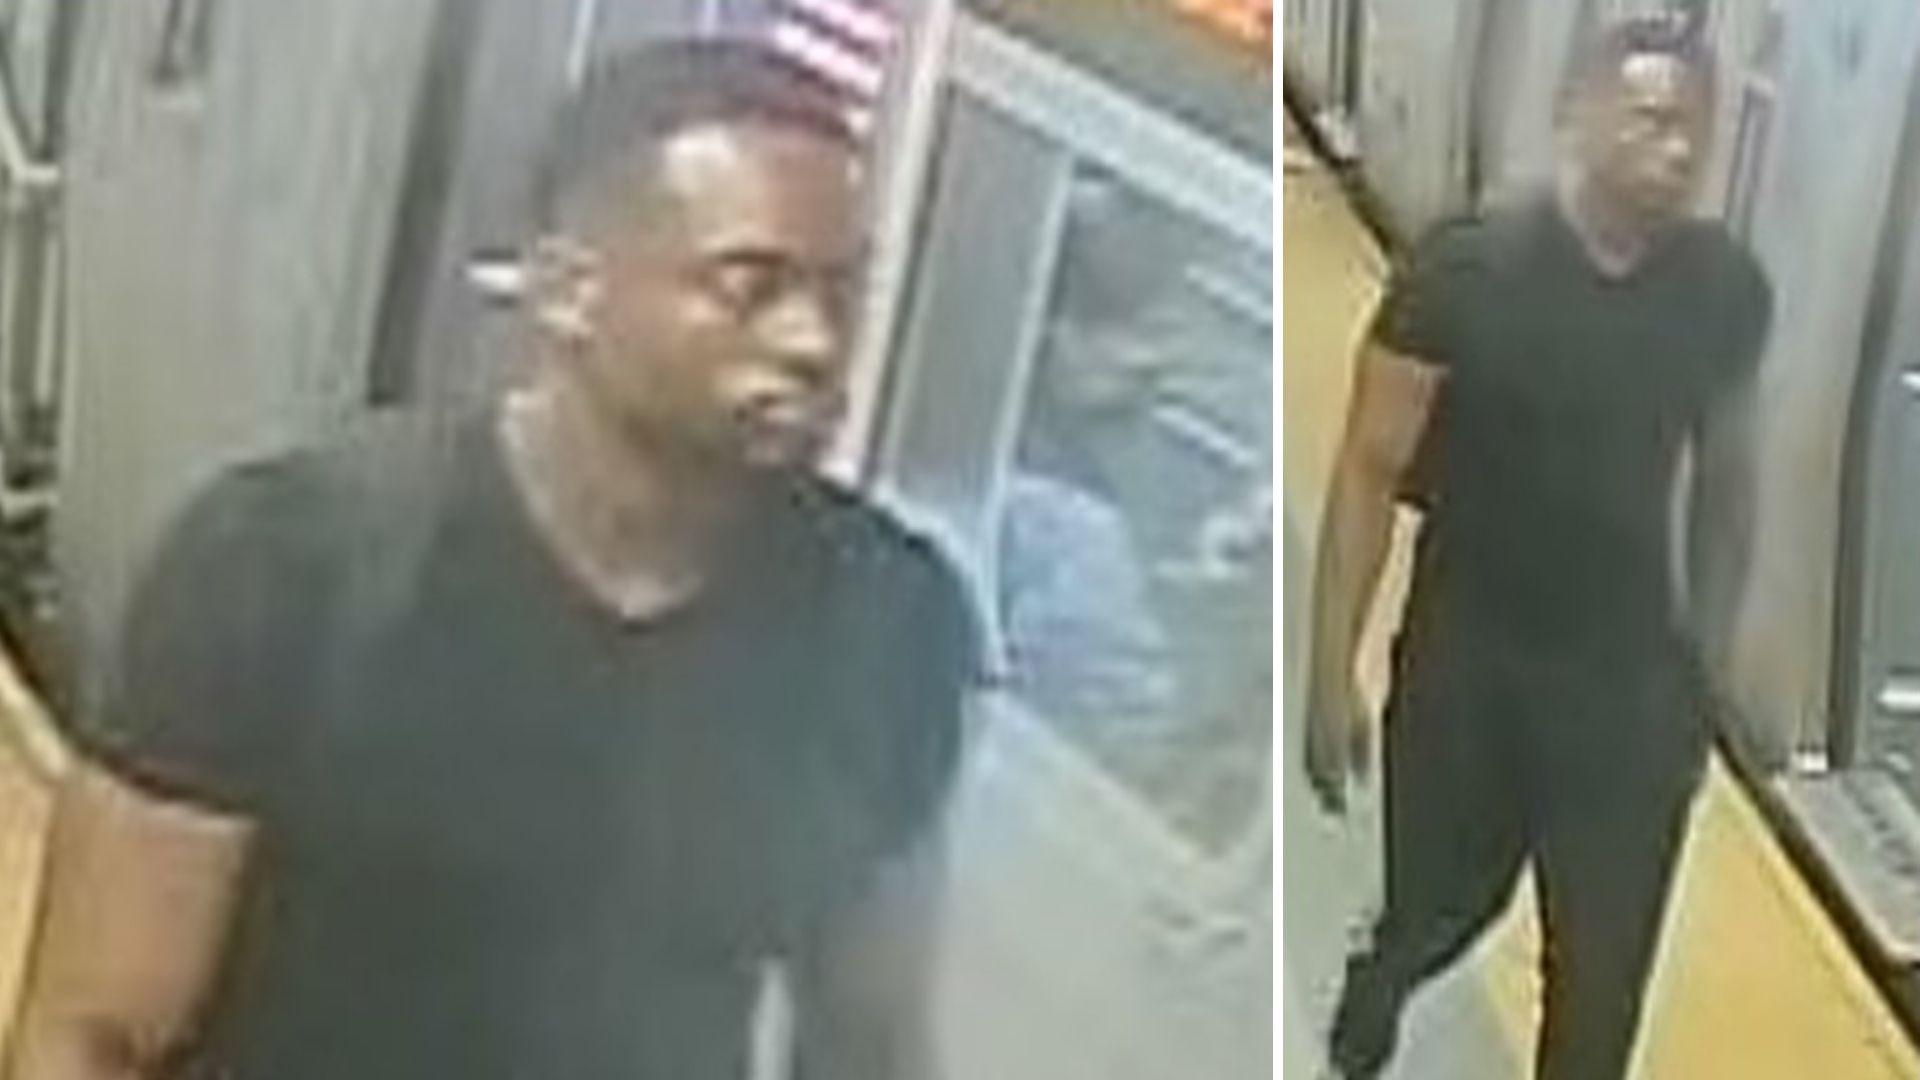 Man accused of exposing himself on Manhattan subway